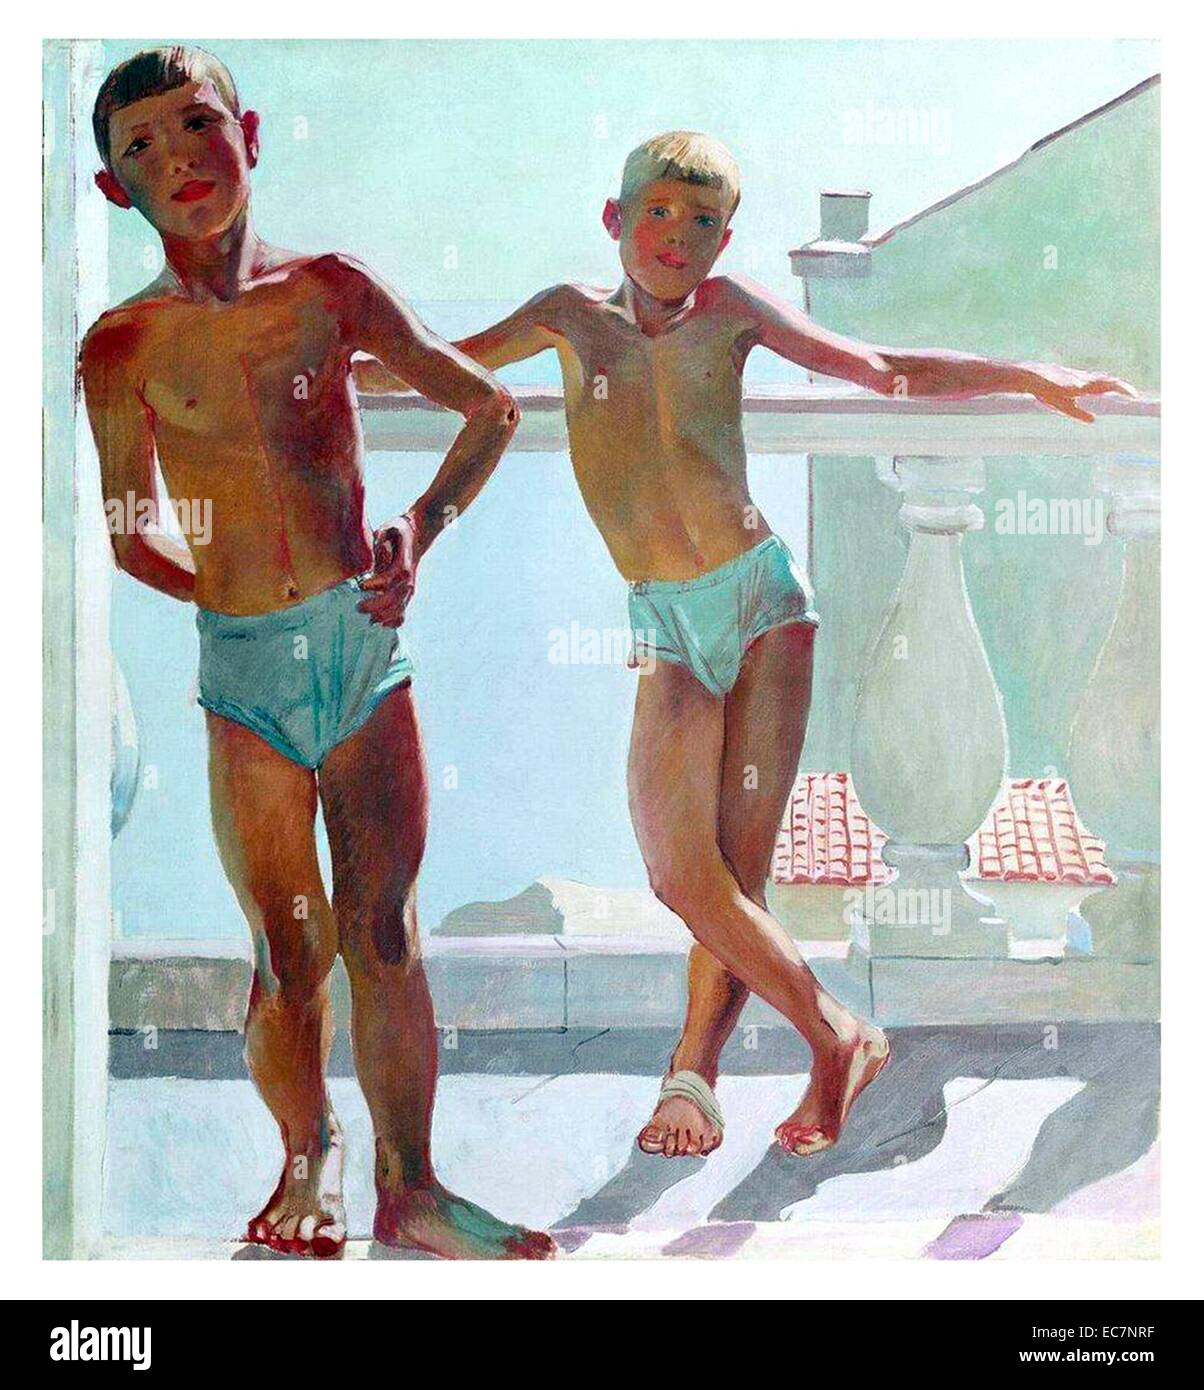 Alexander Deineka (Soviet Realist artist) Crimea, Young Pioneers 1935 - Stock Image